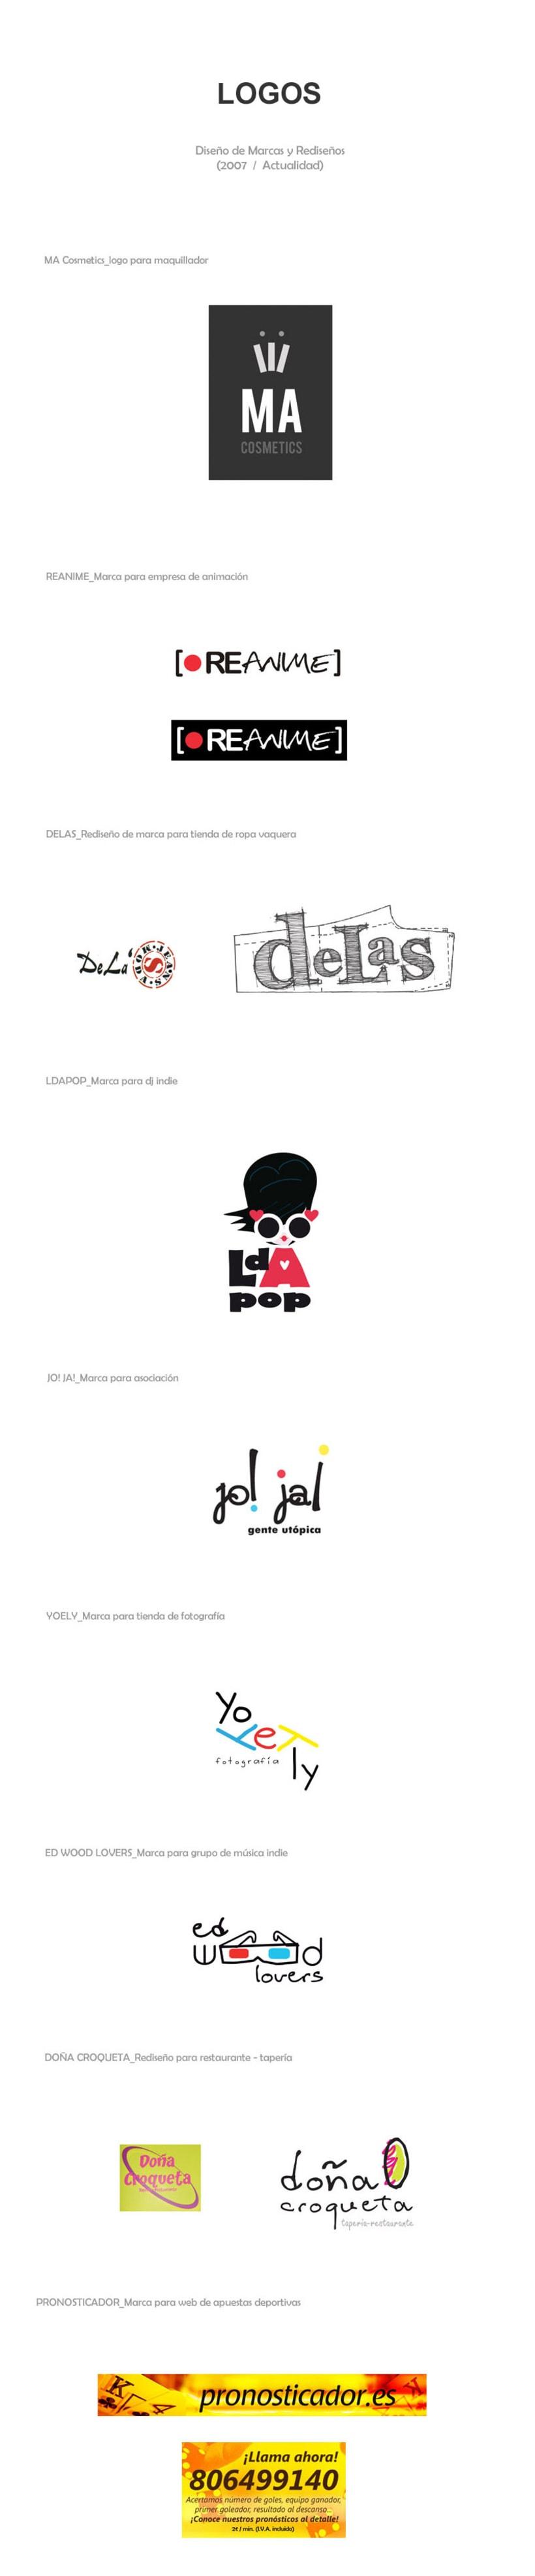 Identidad corporativa. Logos 1